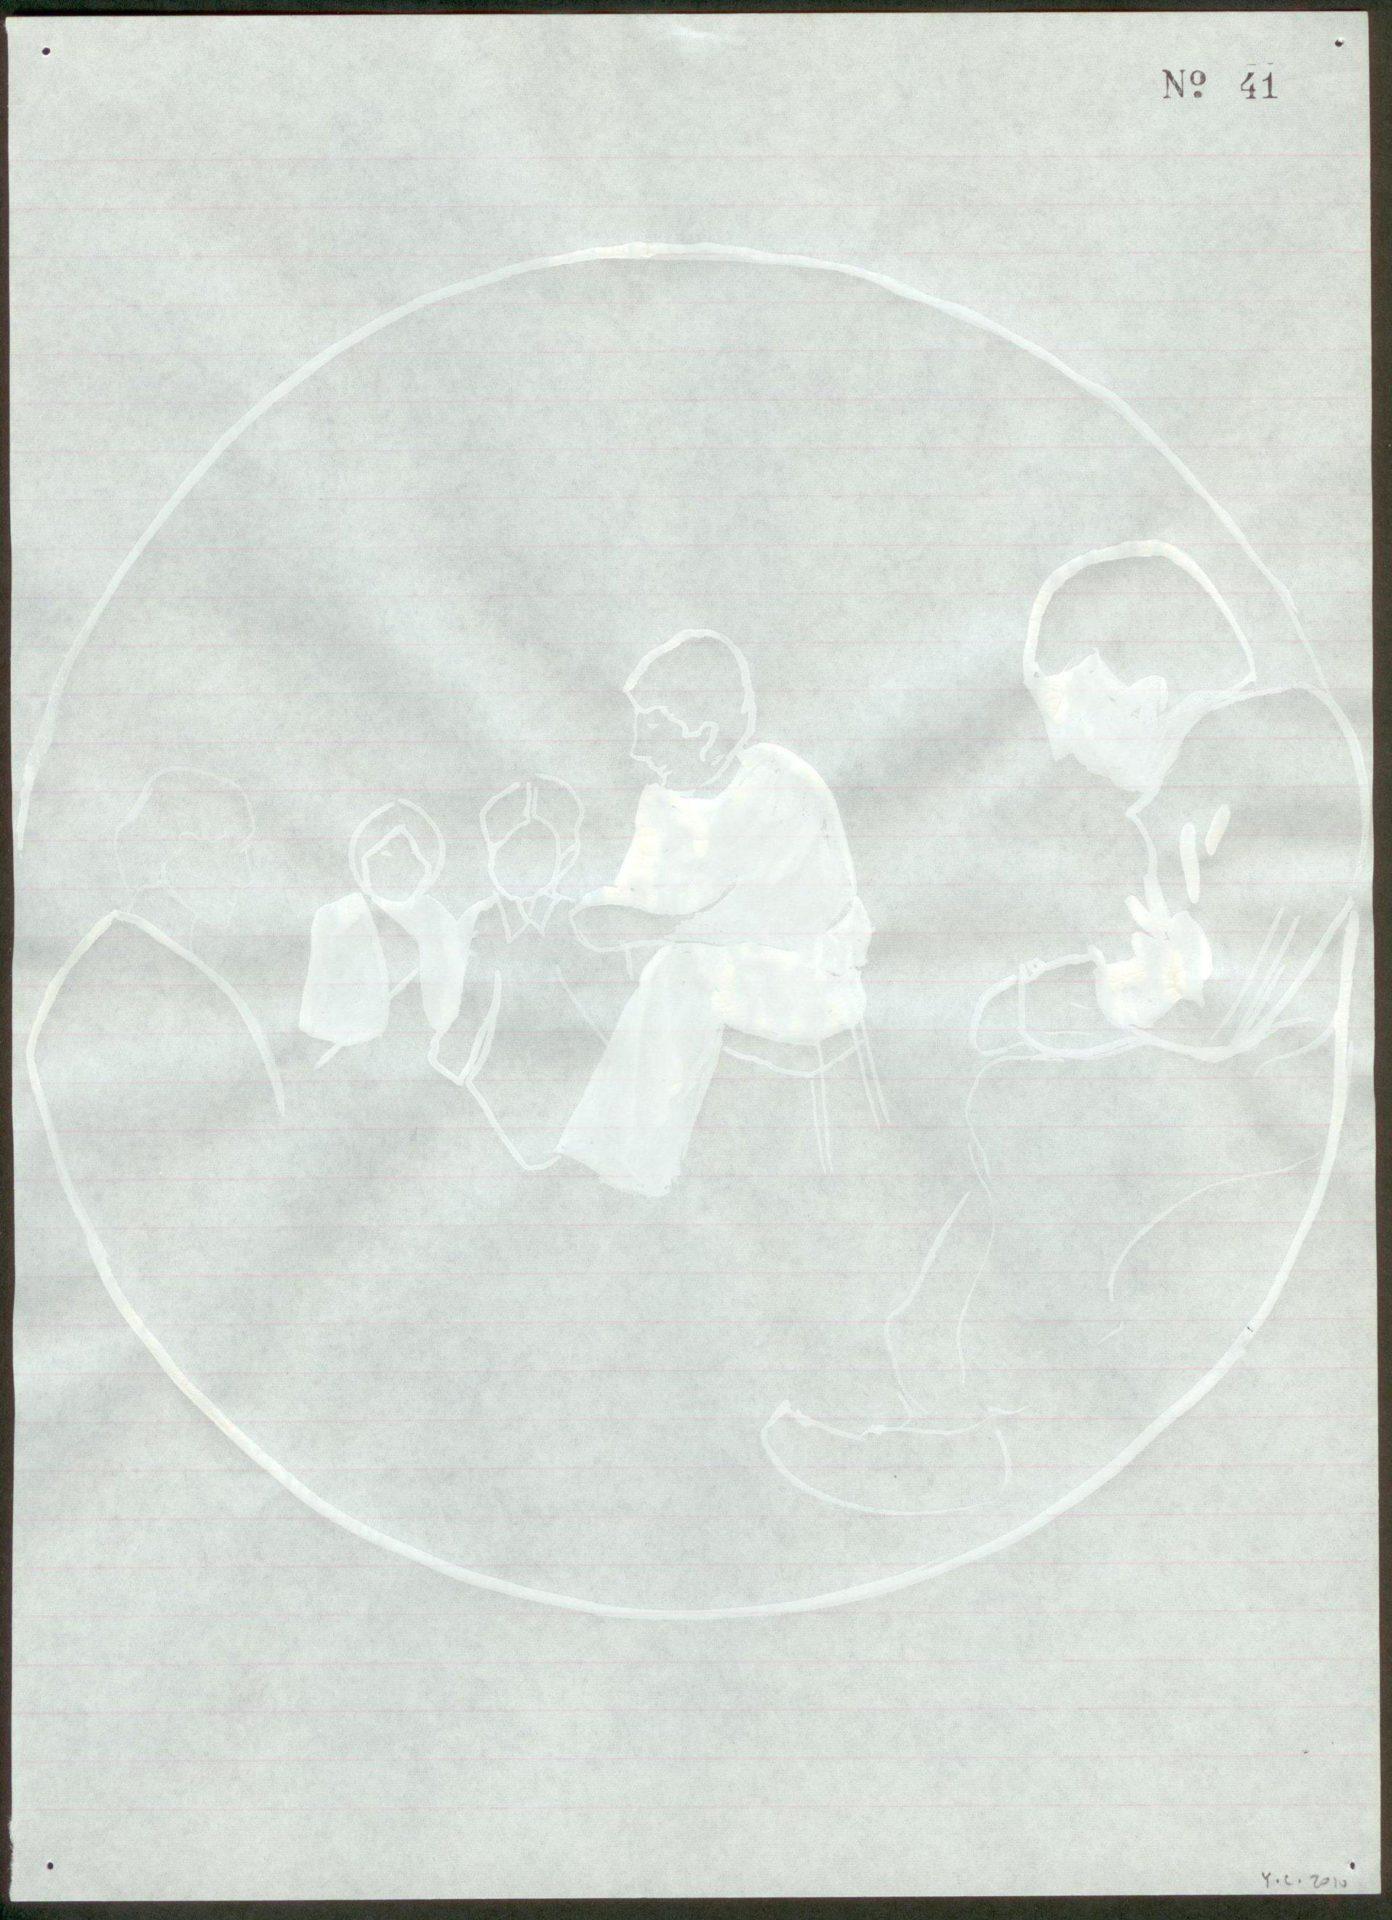 Yane Calovski, Obsessive Setting (Drawings), 2010, (7/12)